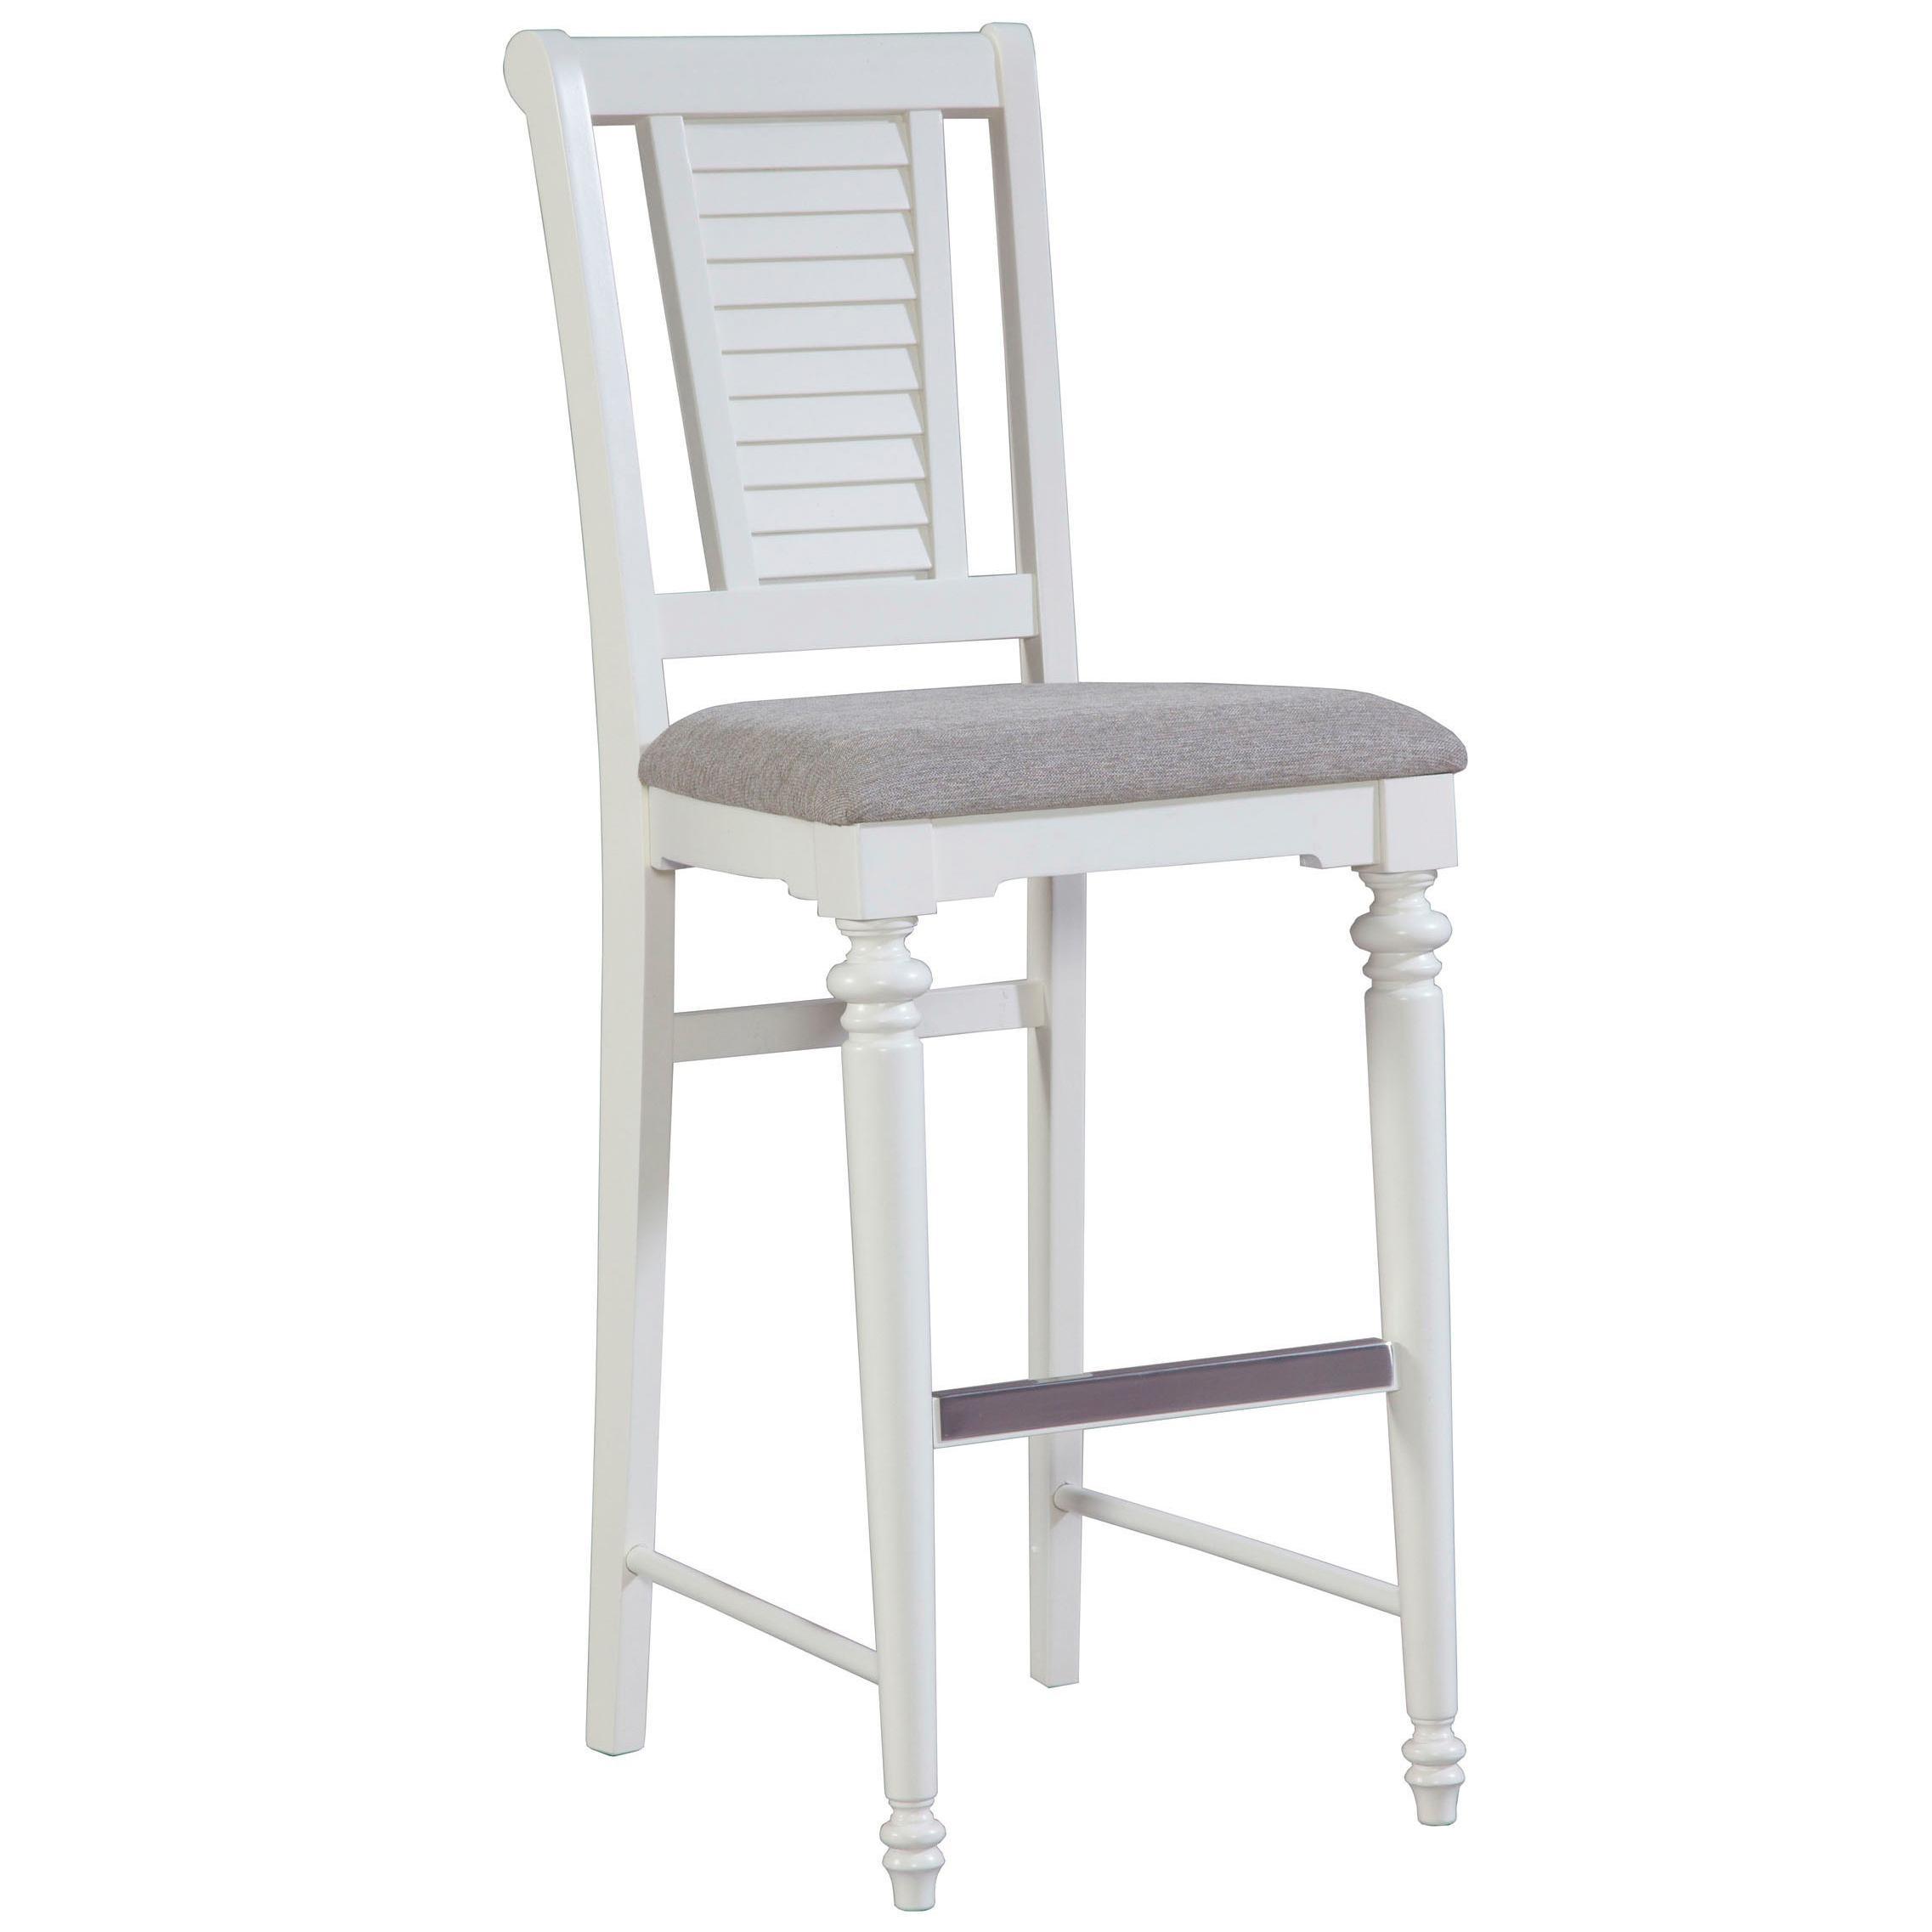 Broyhill Furniture Seabrooke 4471 593 Upholstered Bar